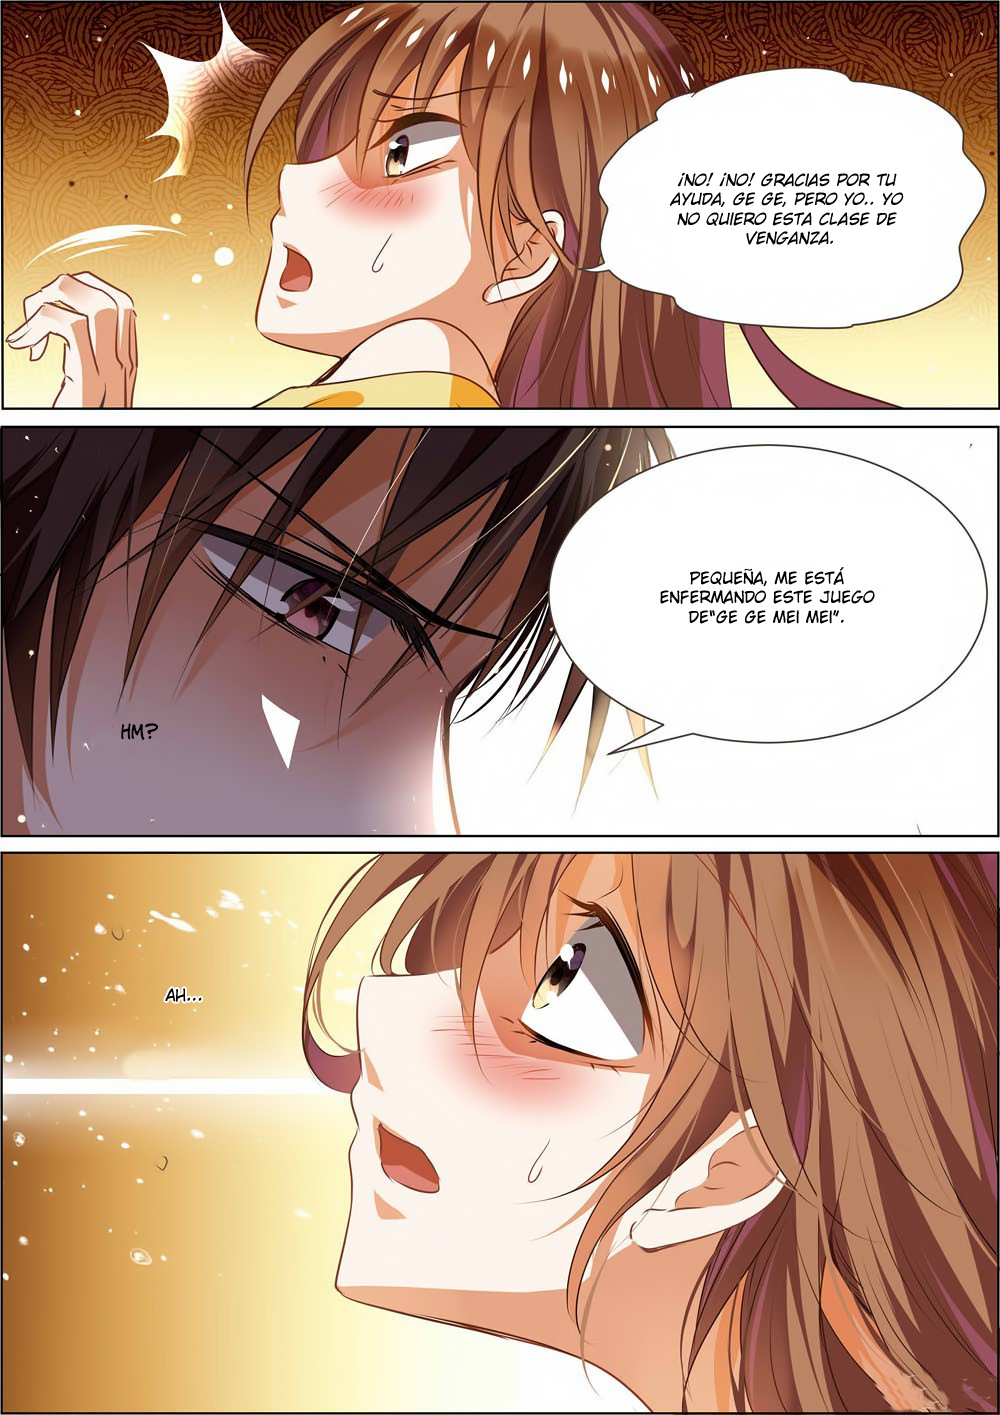 http://c5.ninemanga.com/es_manga/5/16069/395470/099ba65d1143542d90b8c40c0df683bd.jpg Page 6